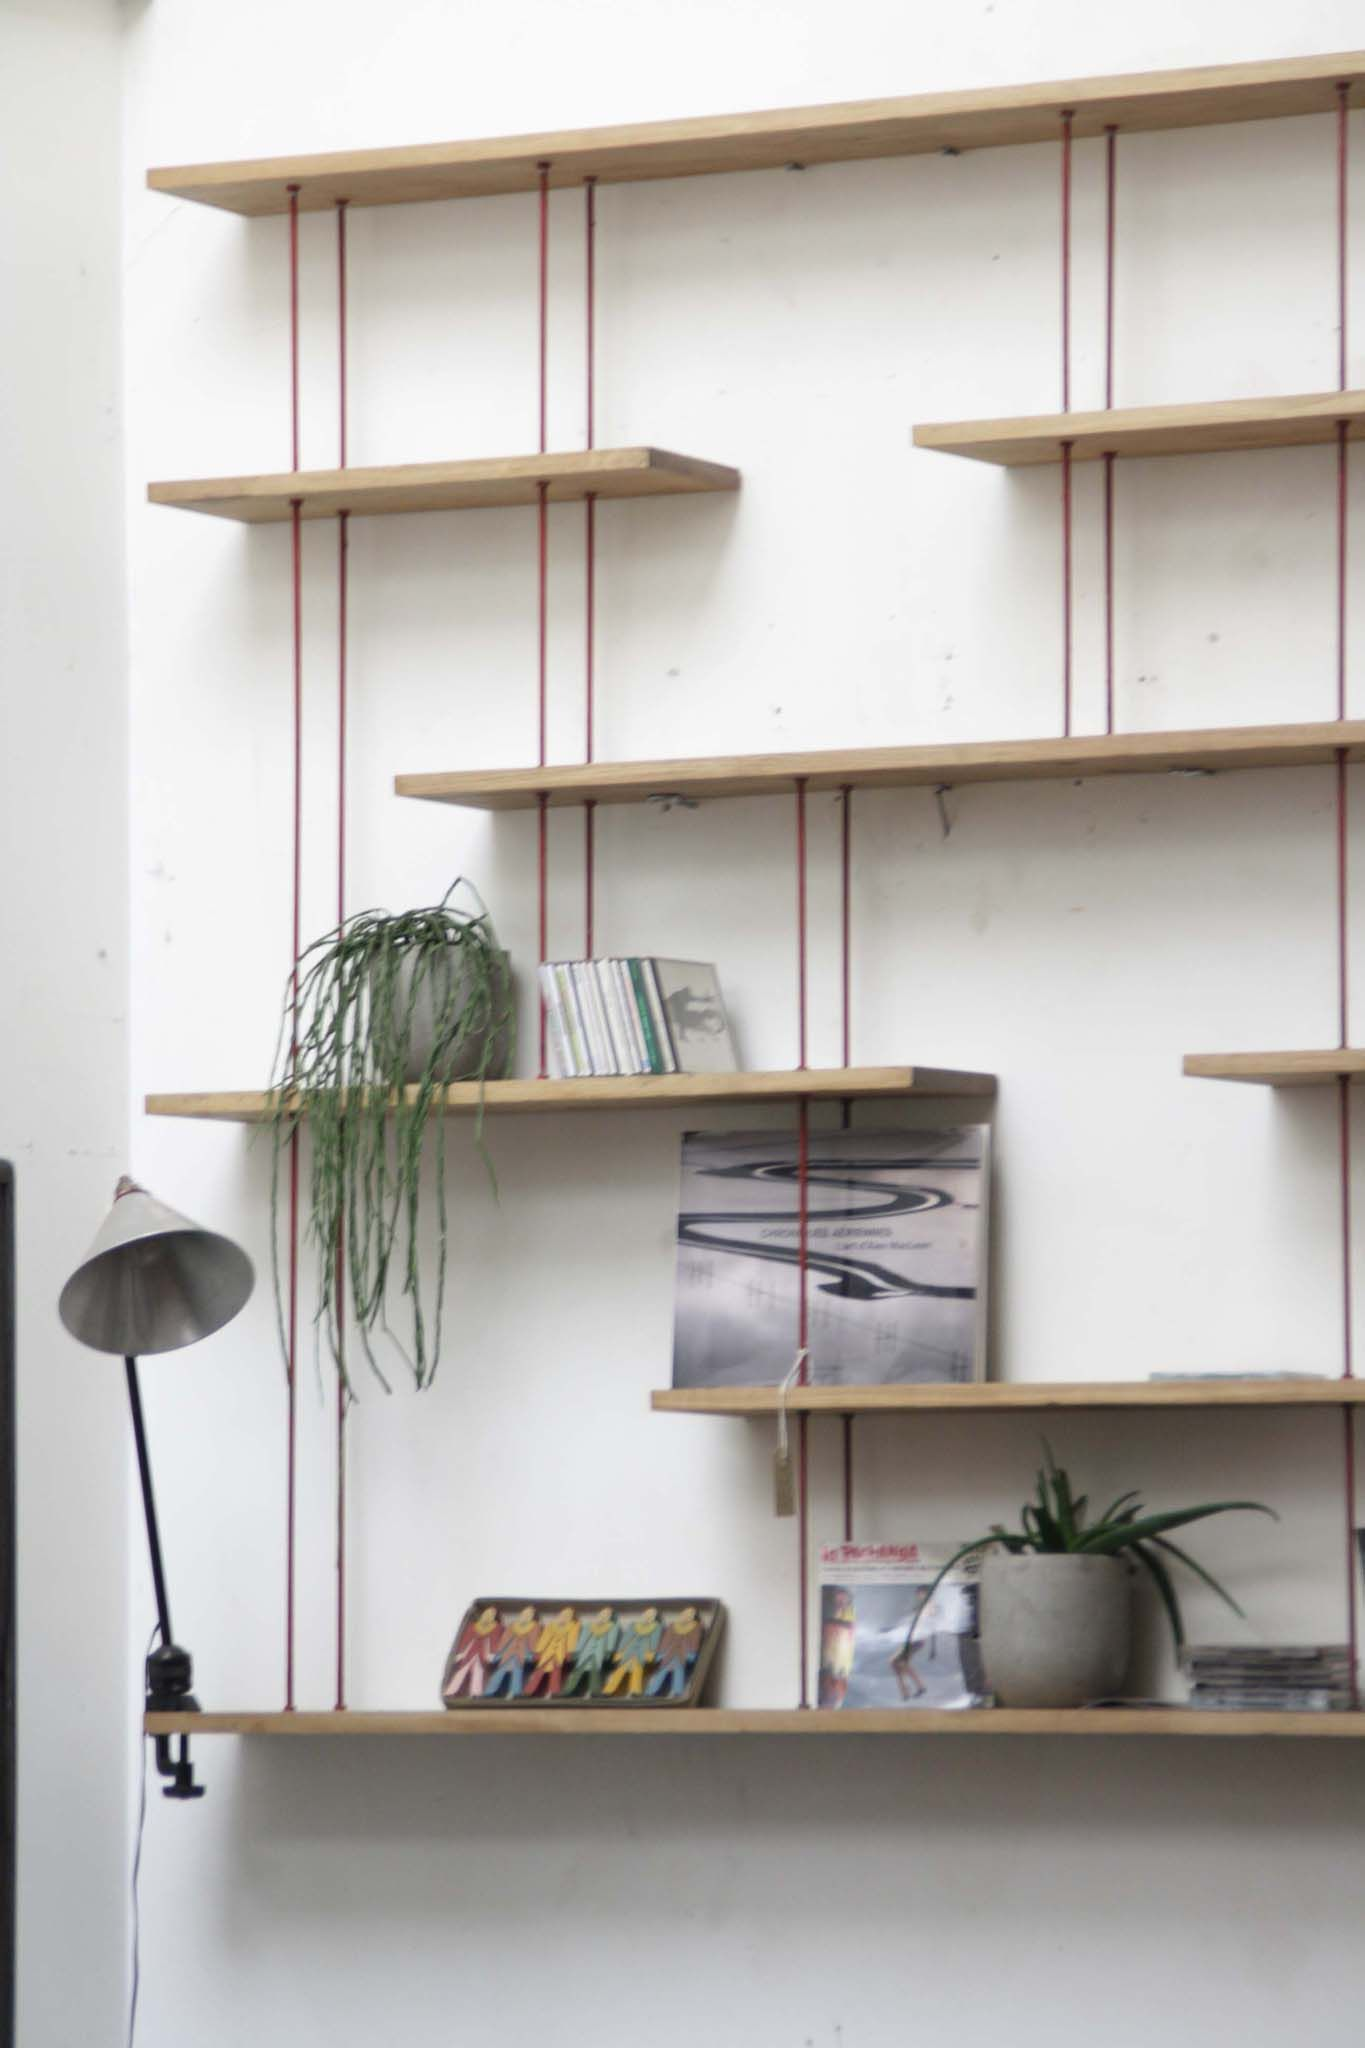 etag res industrielles murales id es fournitures en. Black Bedroom Furniture Sets. Home Design Ideas